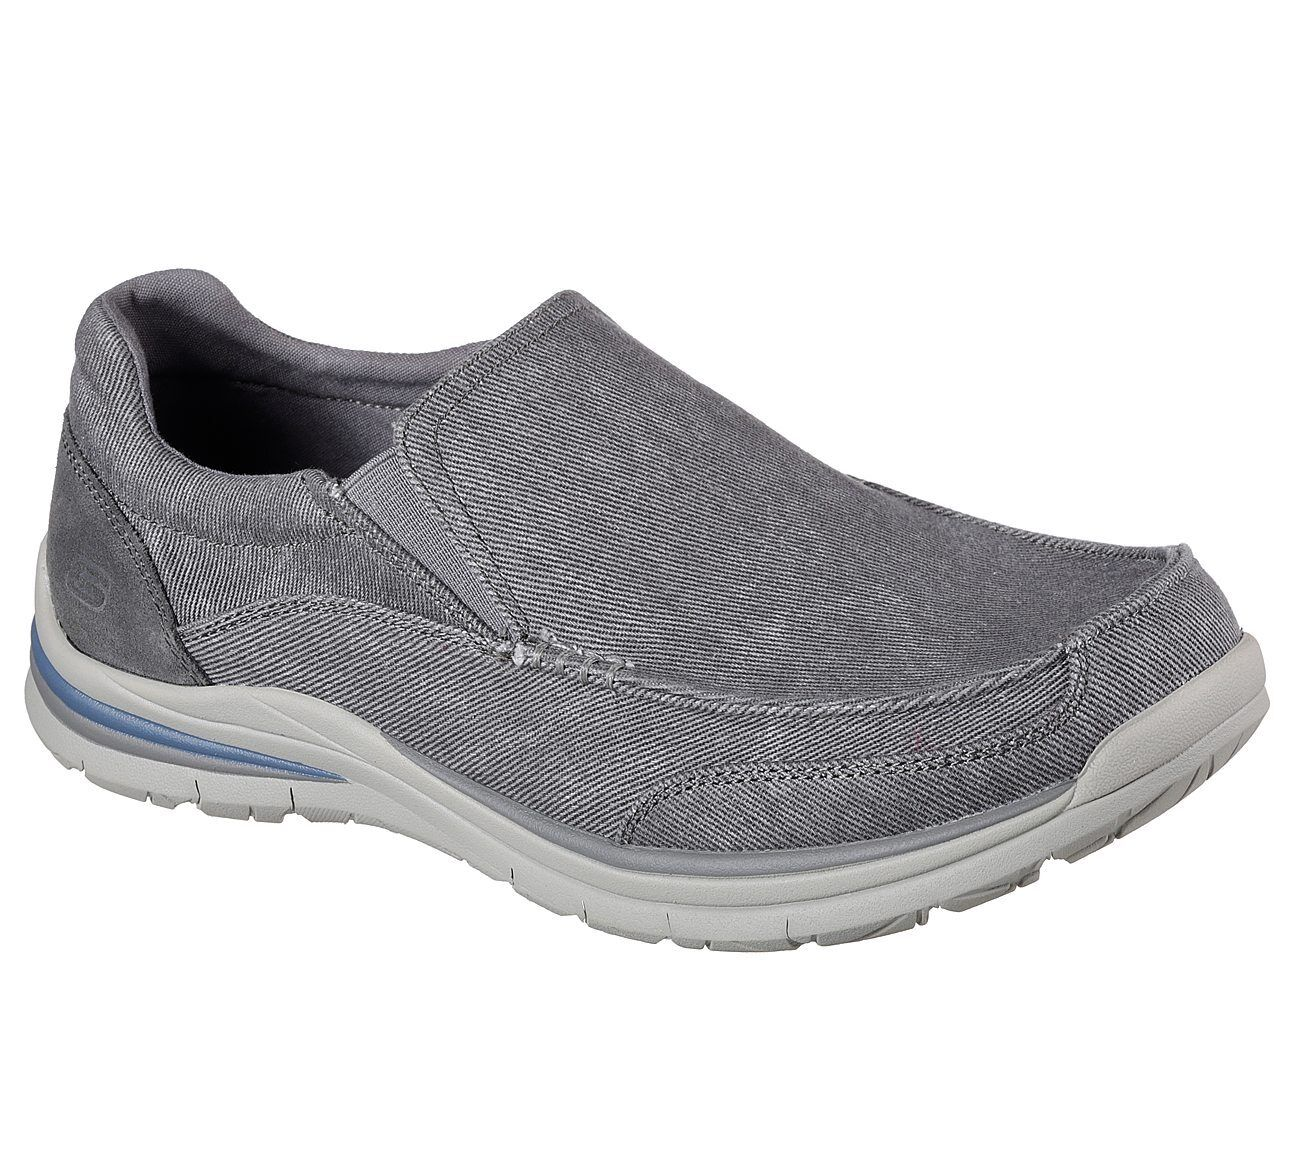 Details zu NEU SKECHERS Herren Sneakers SUPERIOR 2.0 VORADO Grau